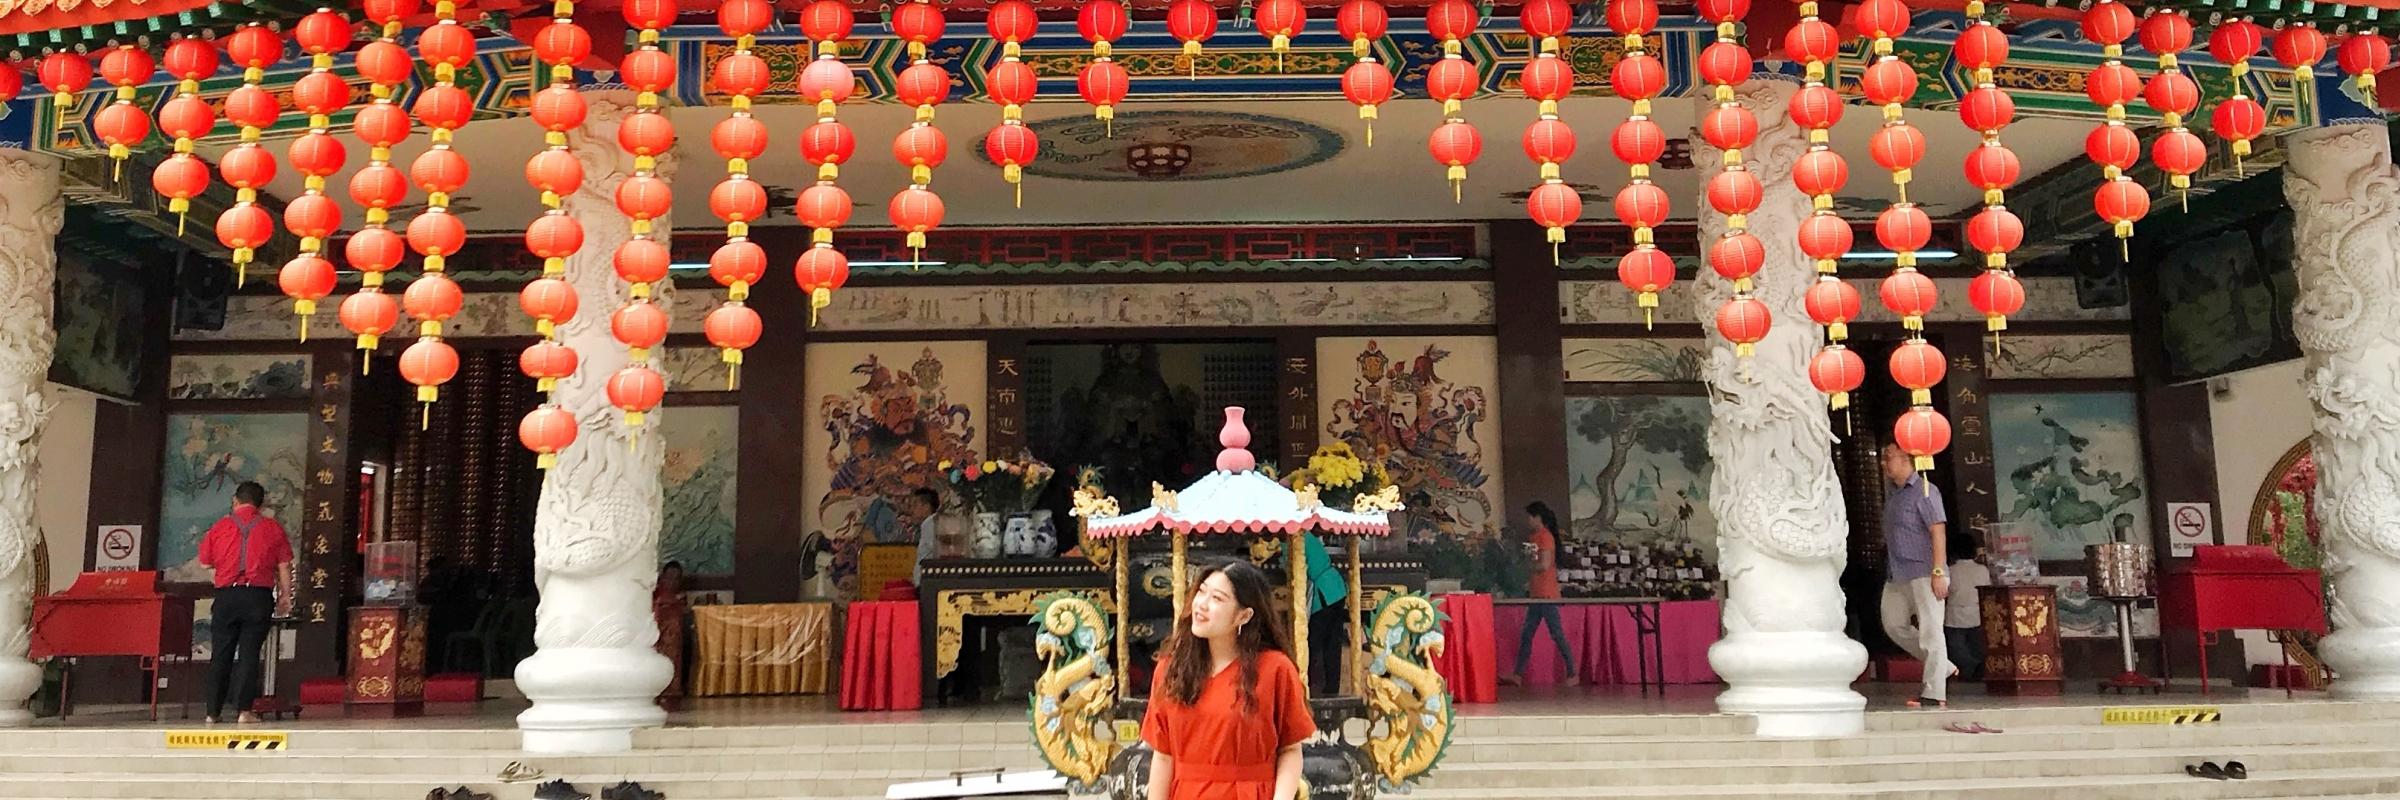 https://gody.vn/blog/14713052479508/post/malaysia-penang-meleka-nen-di-hay-khong-6257